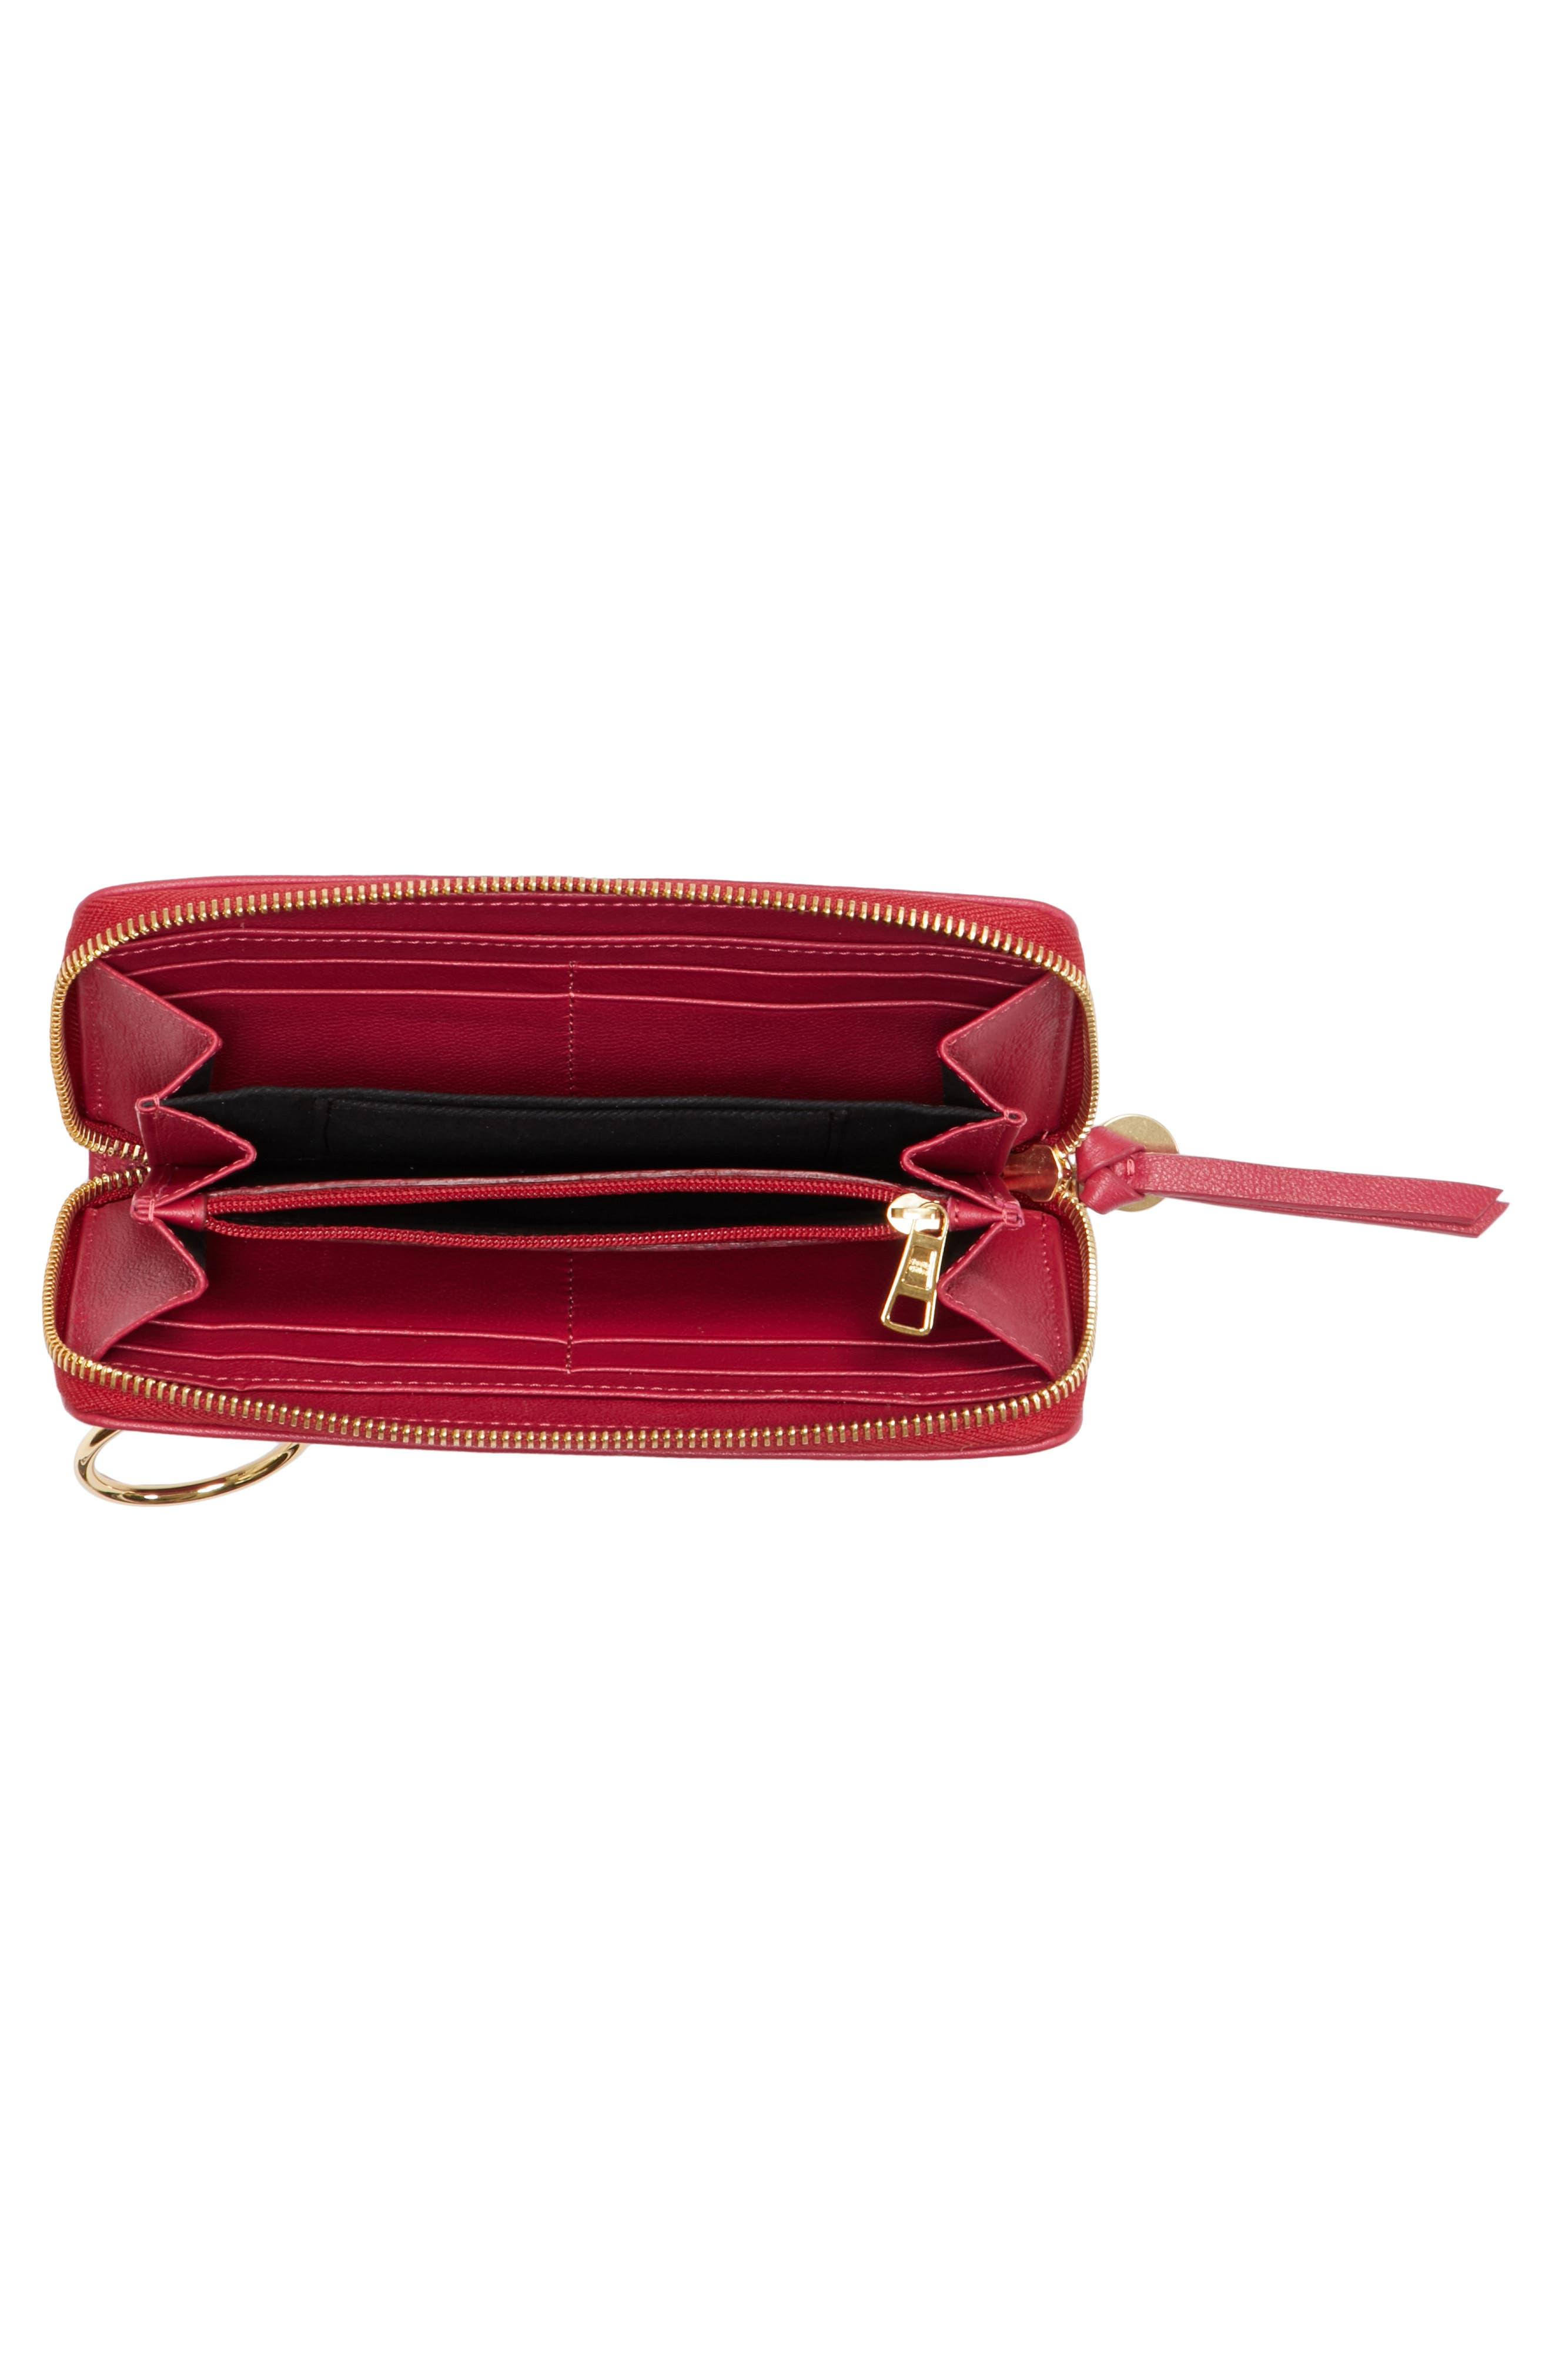 Mino Zip Around Leather Wallet,                             Alternate thumbnail 2, color,                             650